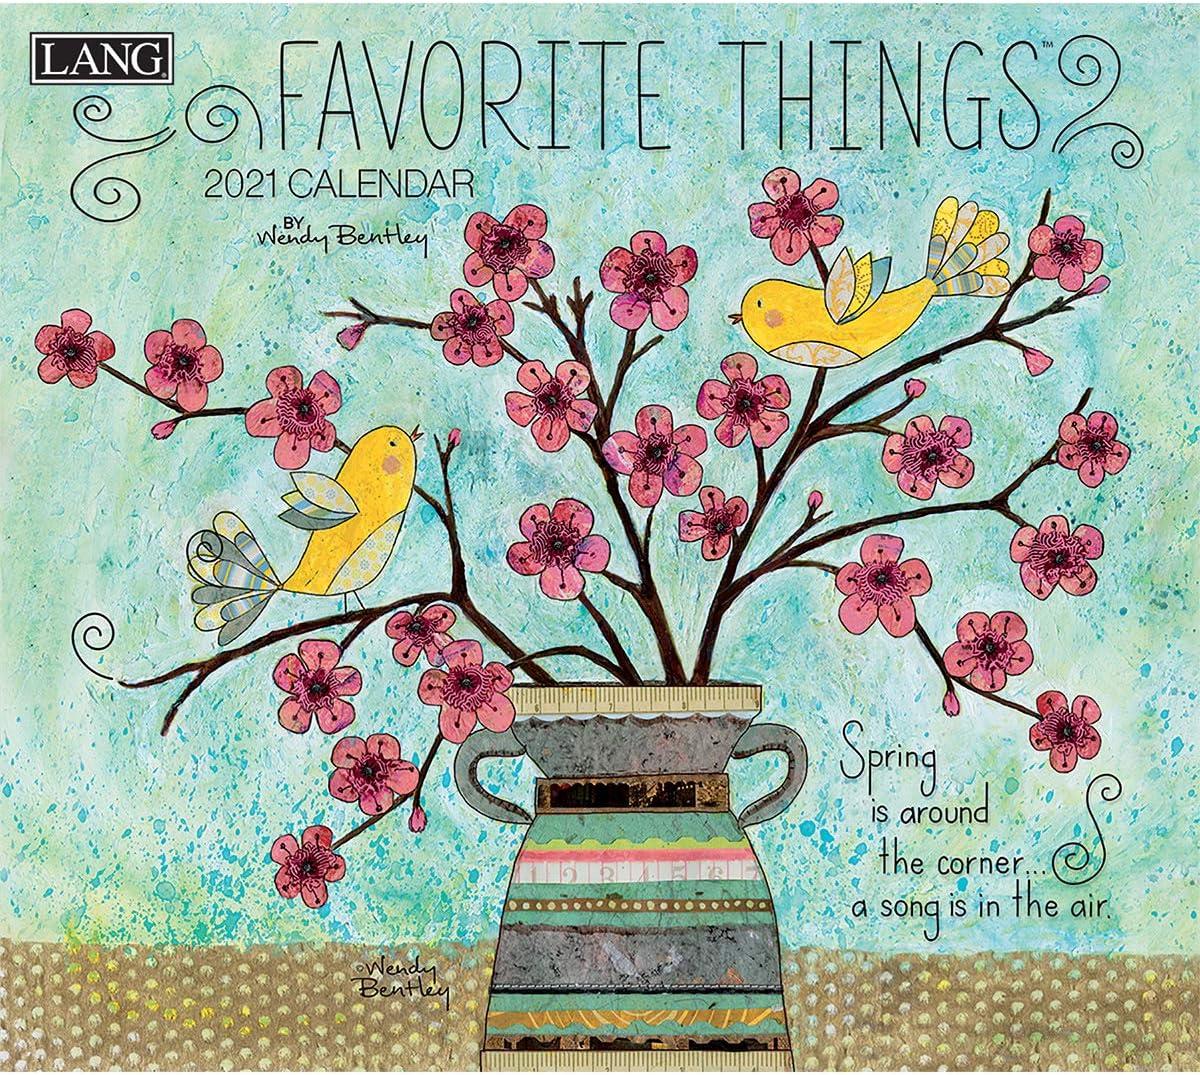 Lang Favorite Things 2021 Wall Calendar (21991001857): Amazon.ca